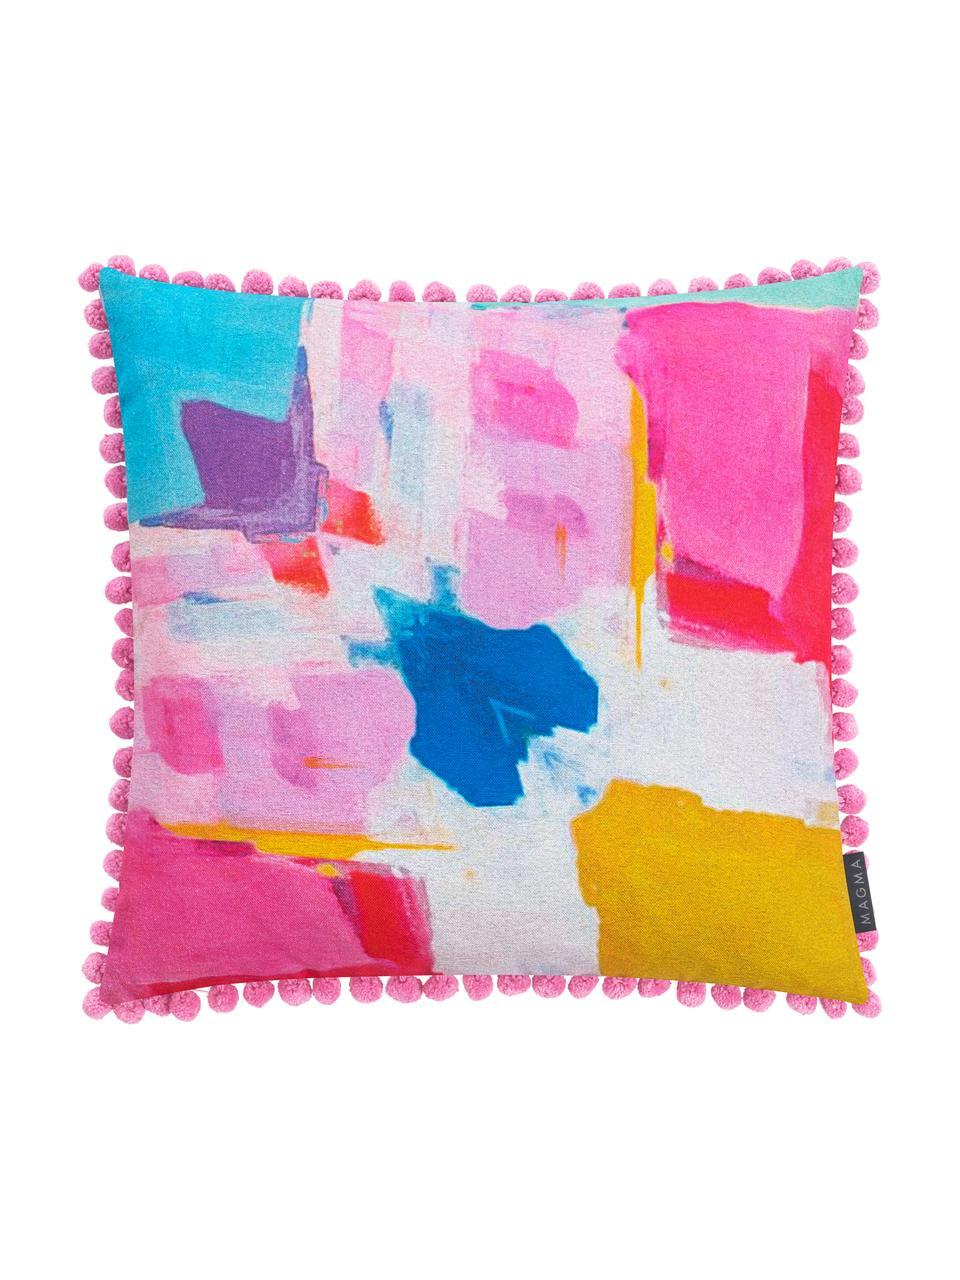 Bunte Kissenhülle Arte mit abstraktem Aquarell Print, Webart: Halbpanama, Pink, Mehrfarbig, 50 x 50 cm